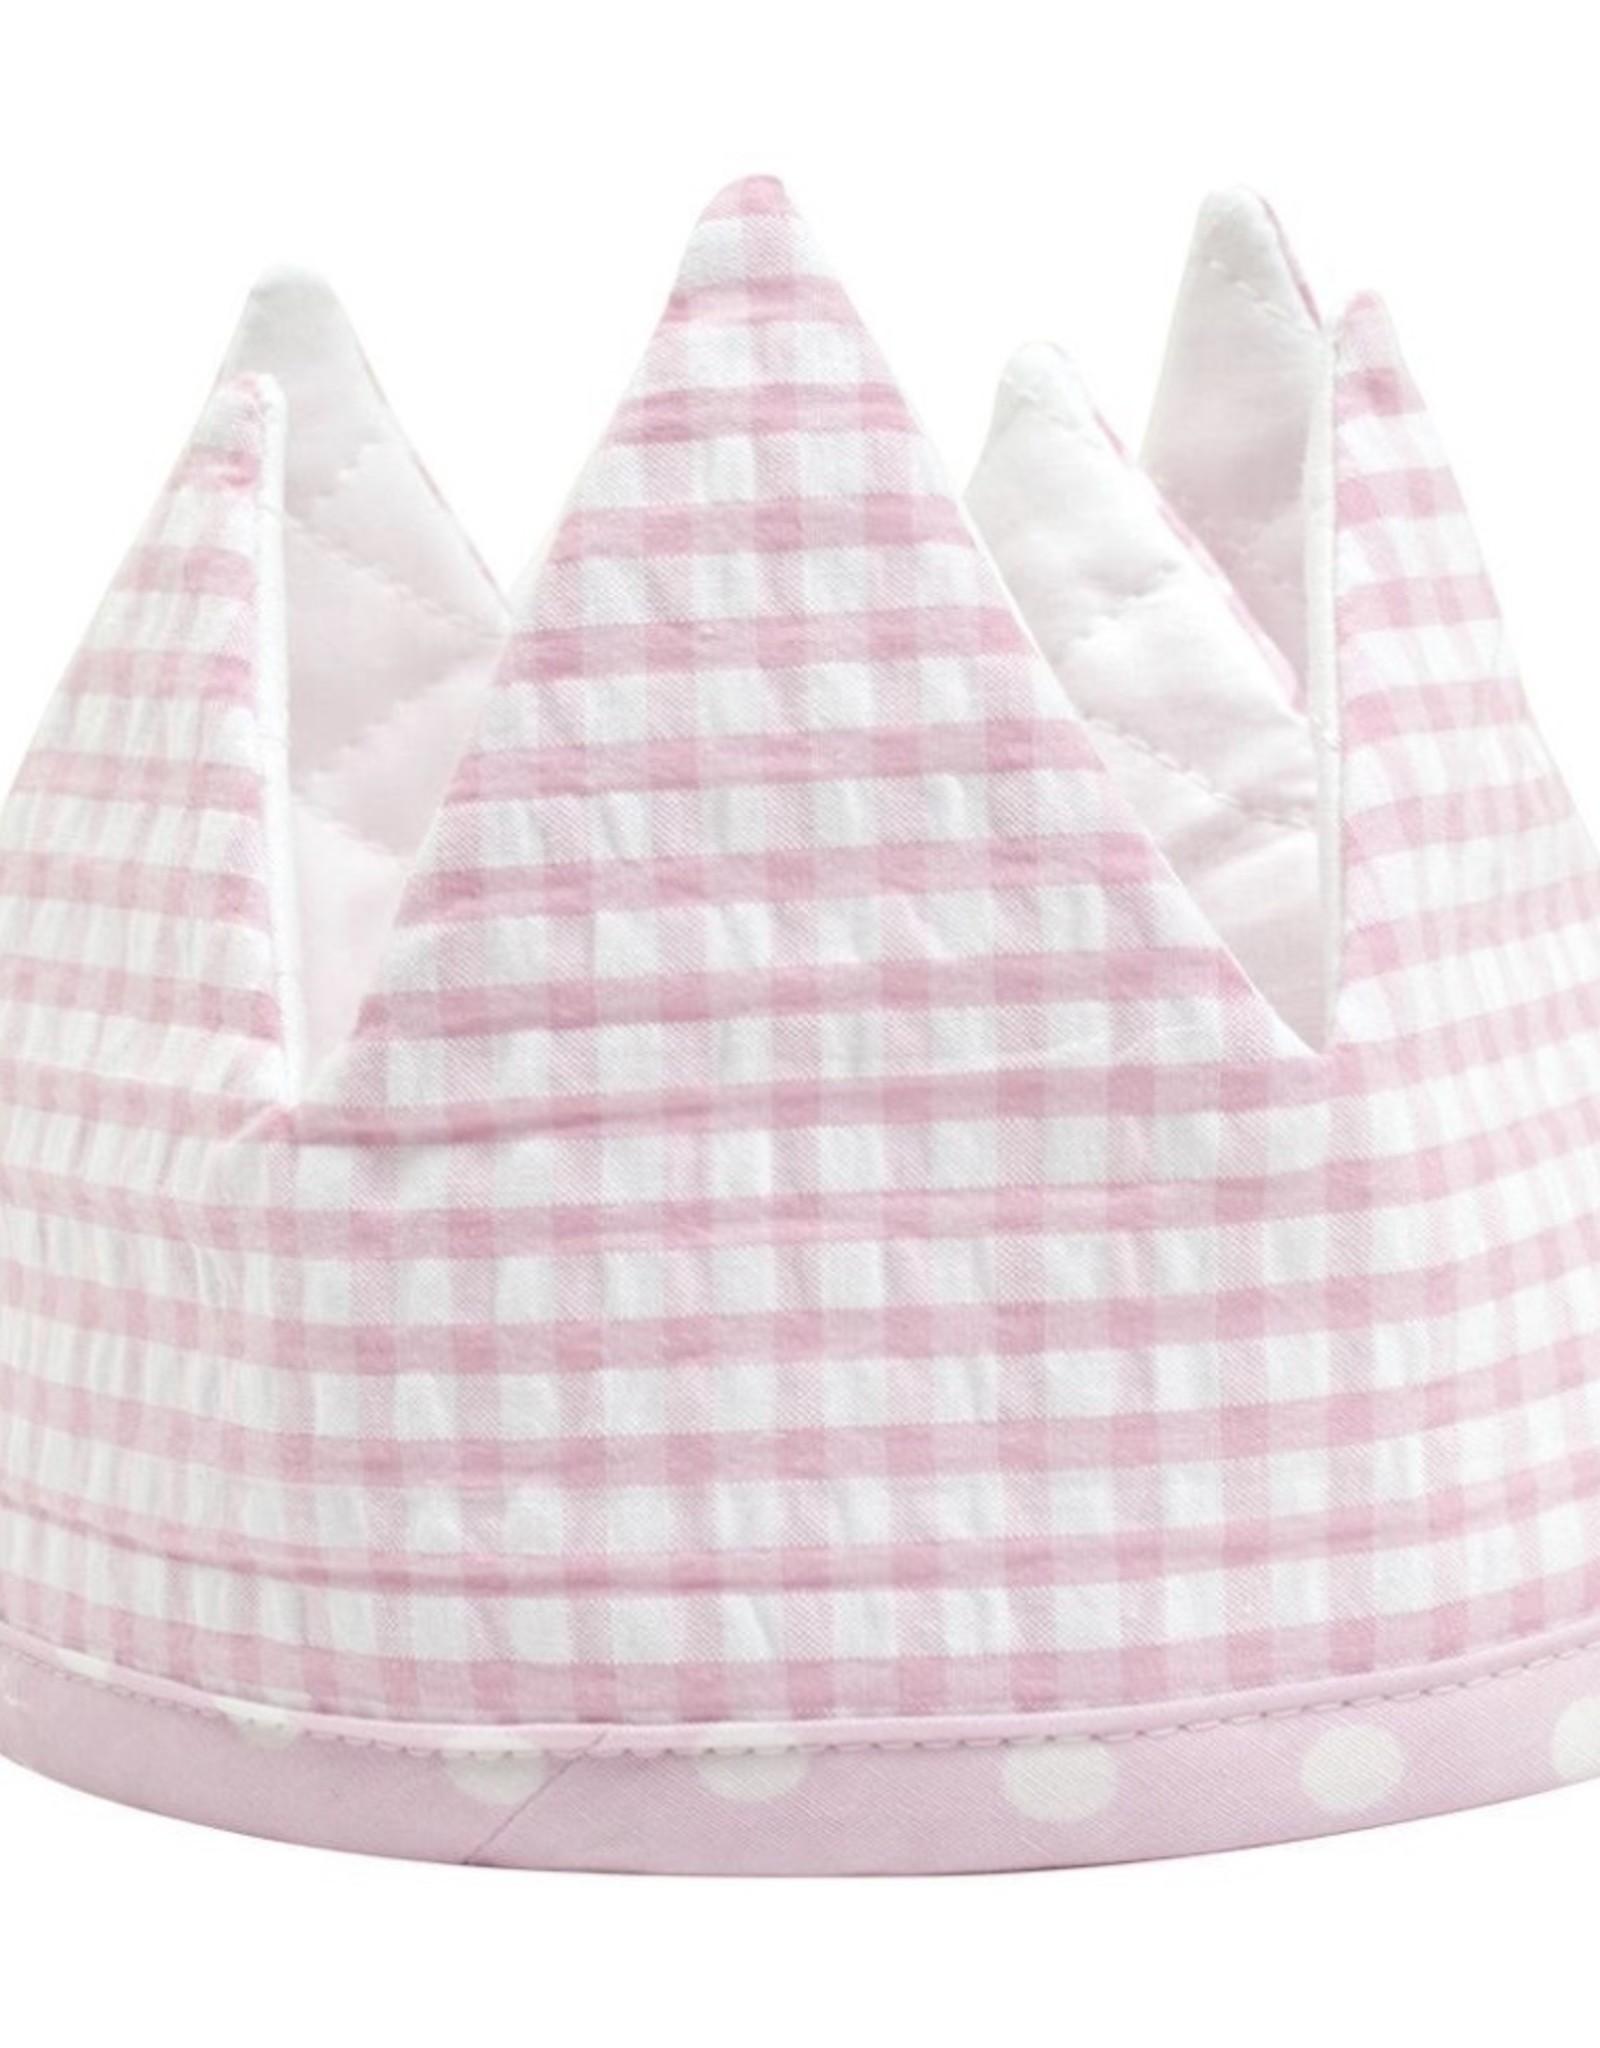 3 Marthas Royal Baby Crown